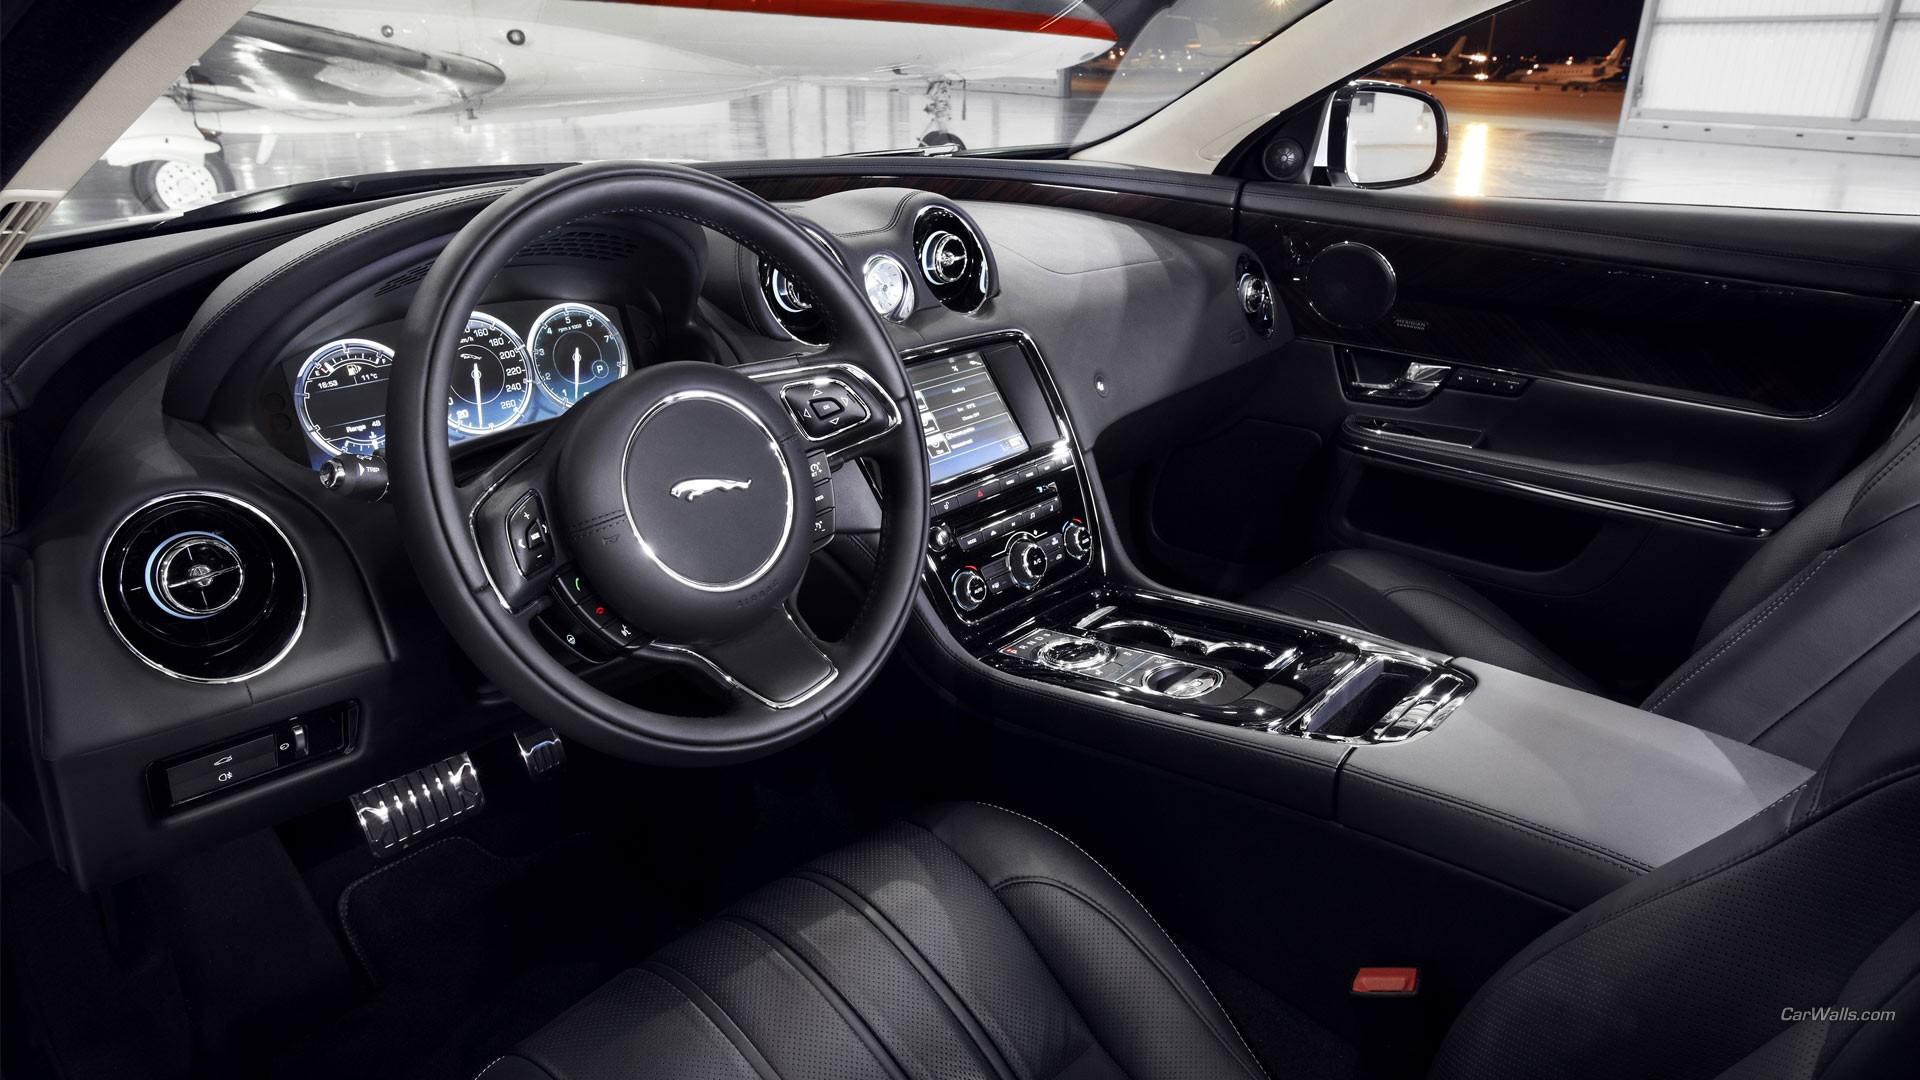 Papel De Parede : Interior Do Carro, Carro Esportivo, Carro Desempenho,  Sedan, Rolls Royce Wraith, Jaguar XJ, Roda, Super Carro, Veículo Terrestre,  ...